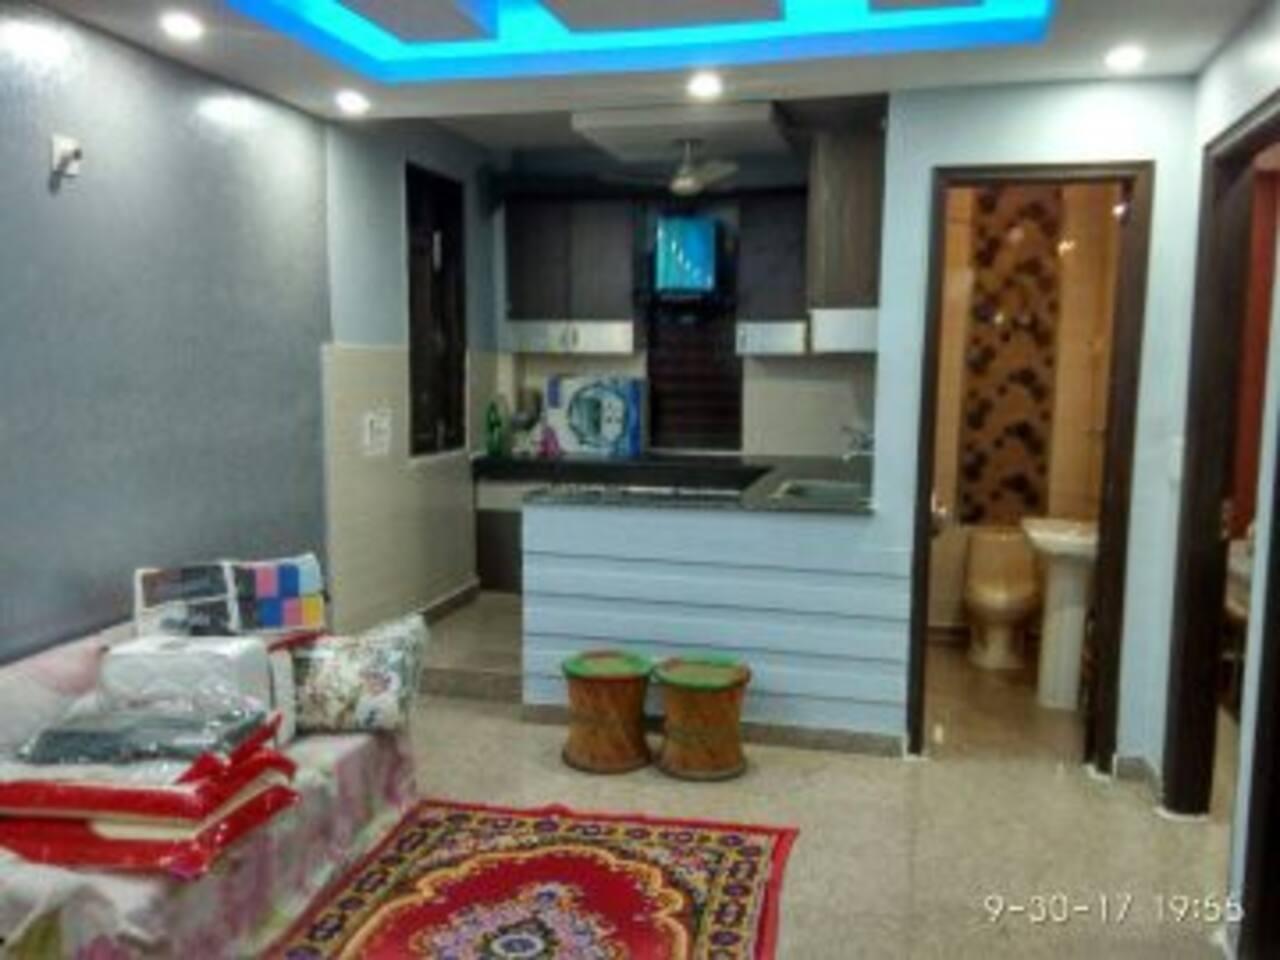 Near Tagore garden METRO New Delhi Apartment - Apartments for Rent ...